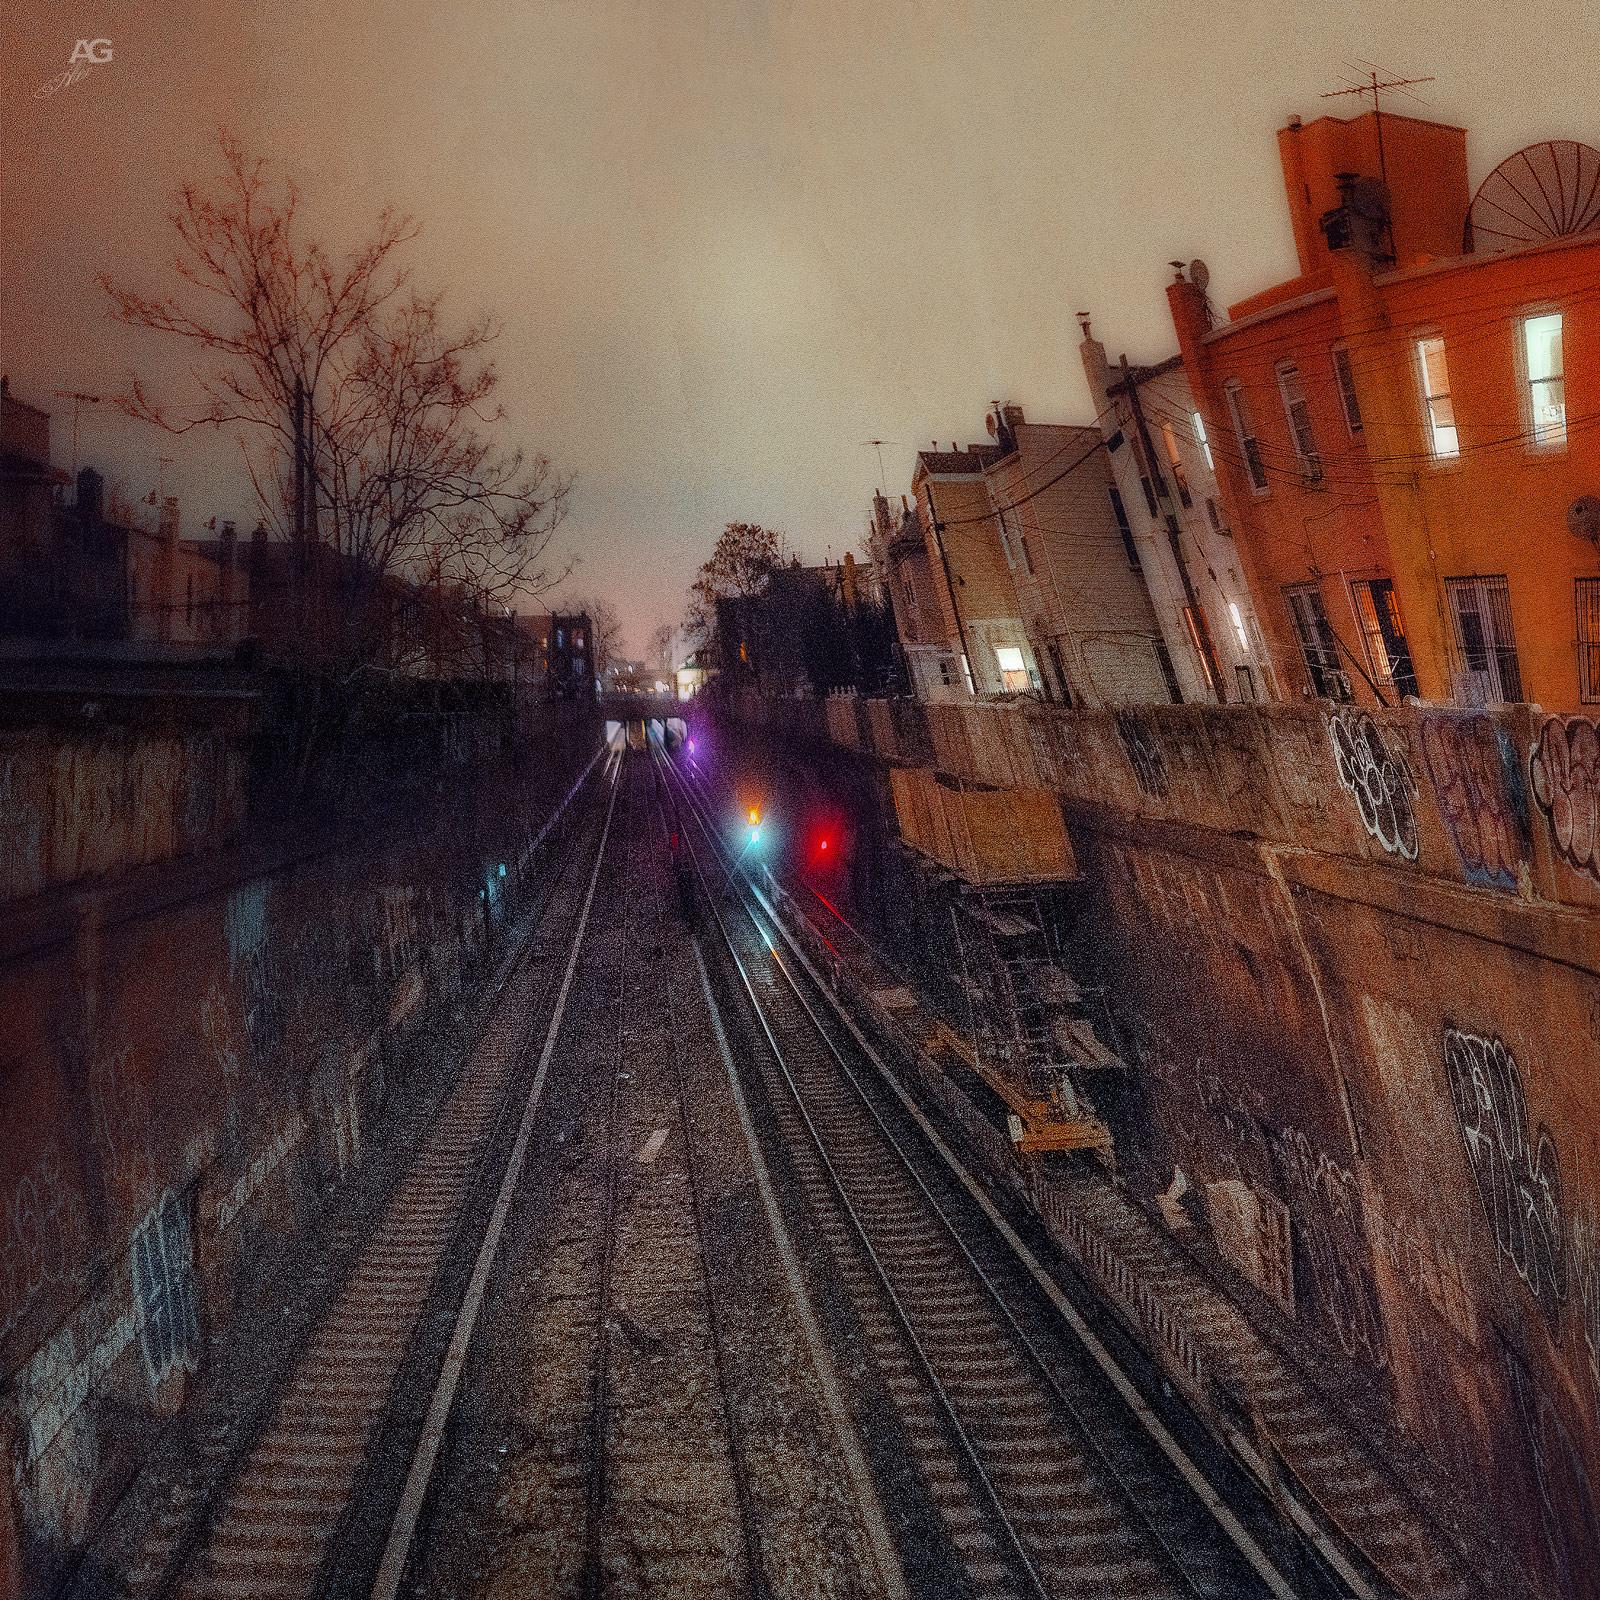 TrainTracksInBrooklynAtWinterNight_warped_1600